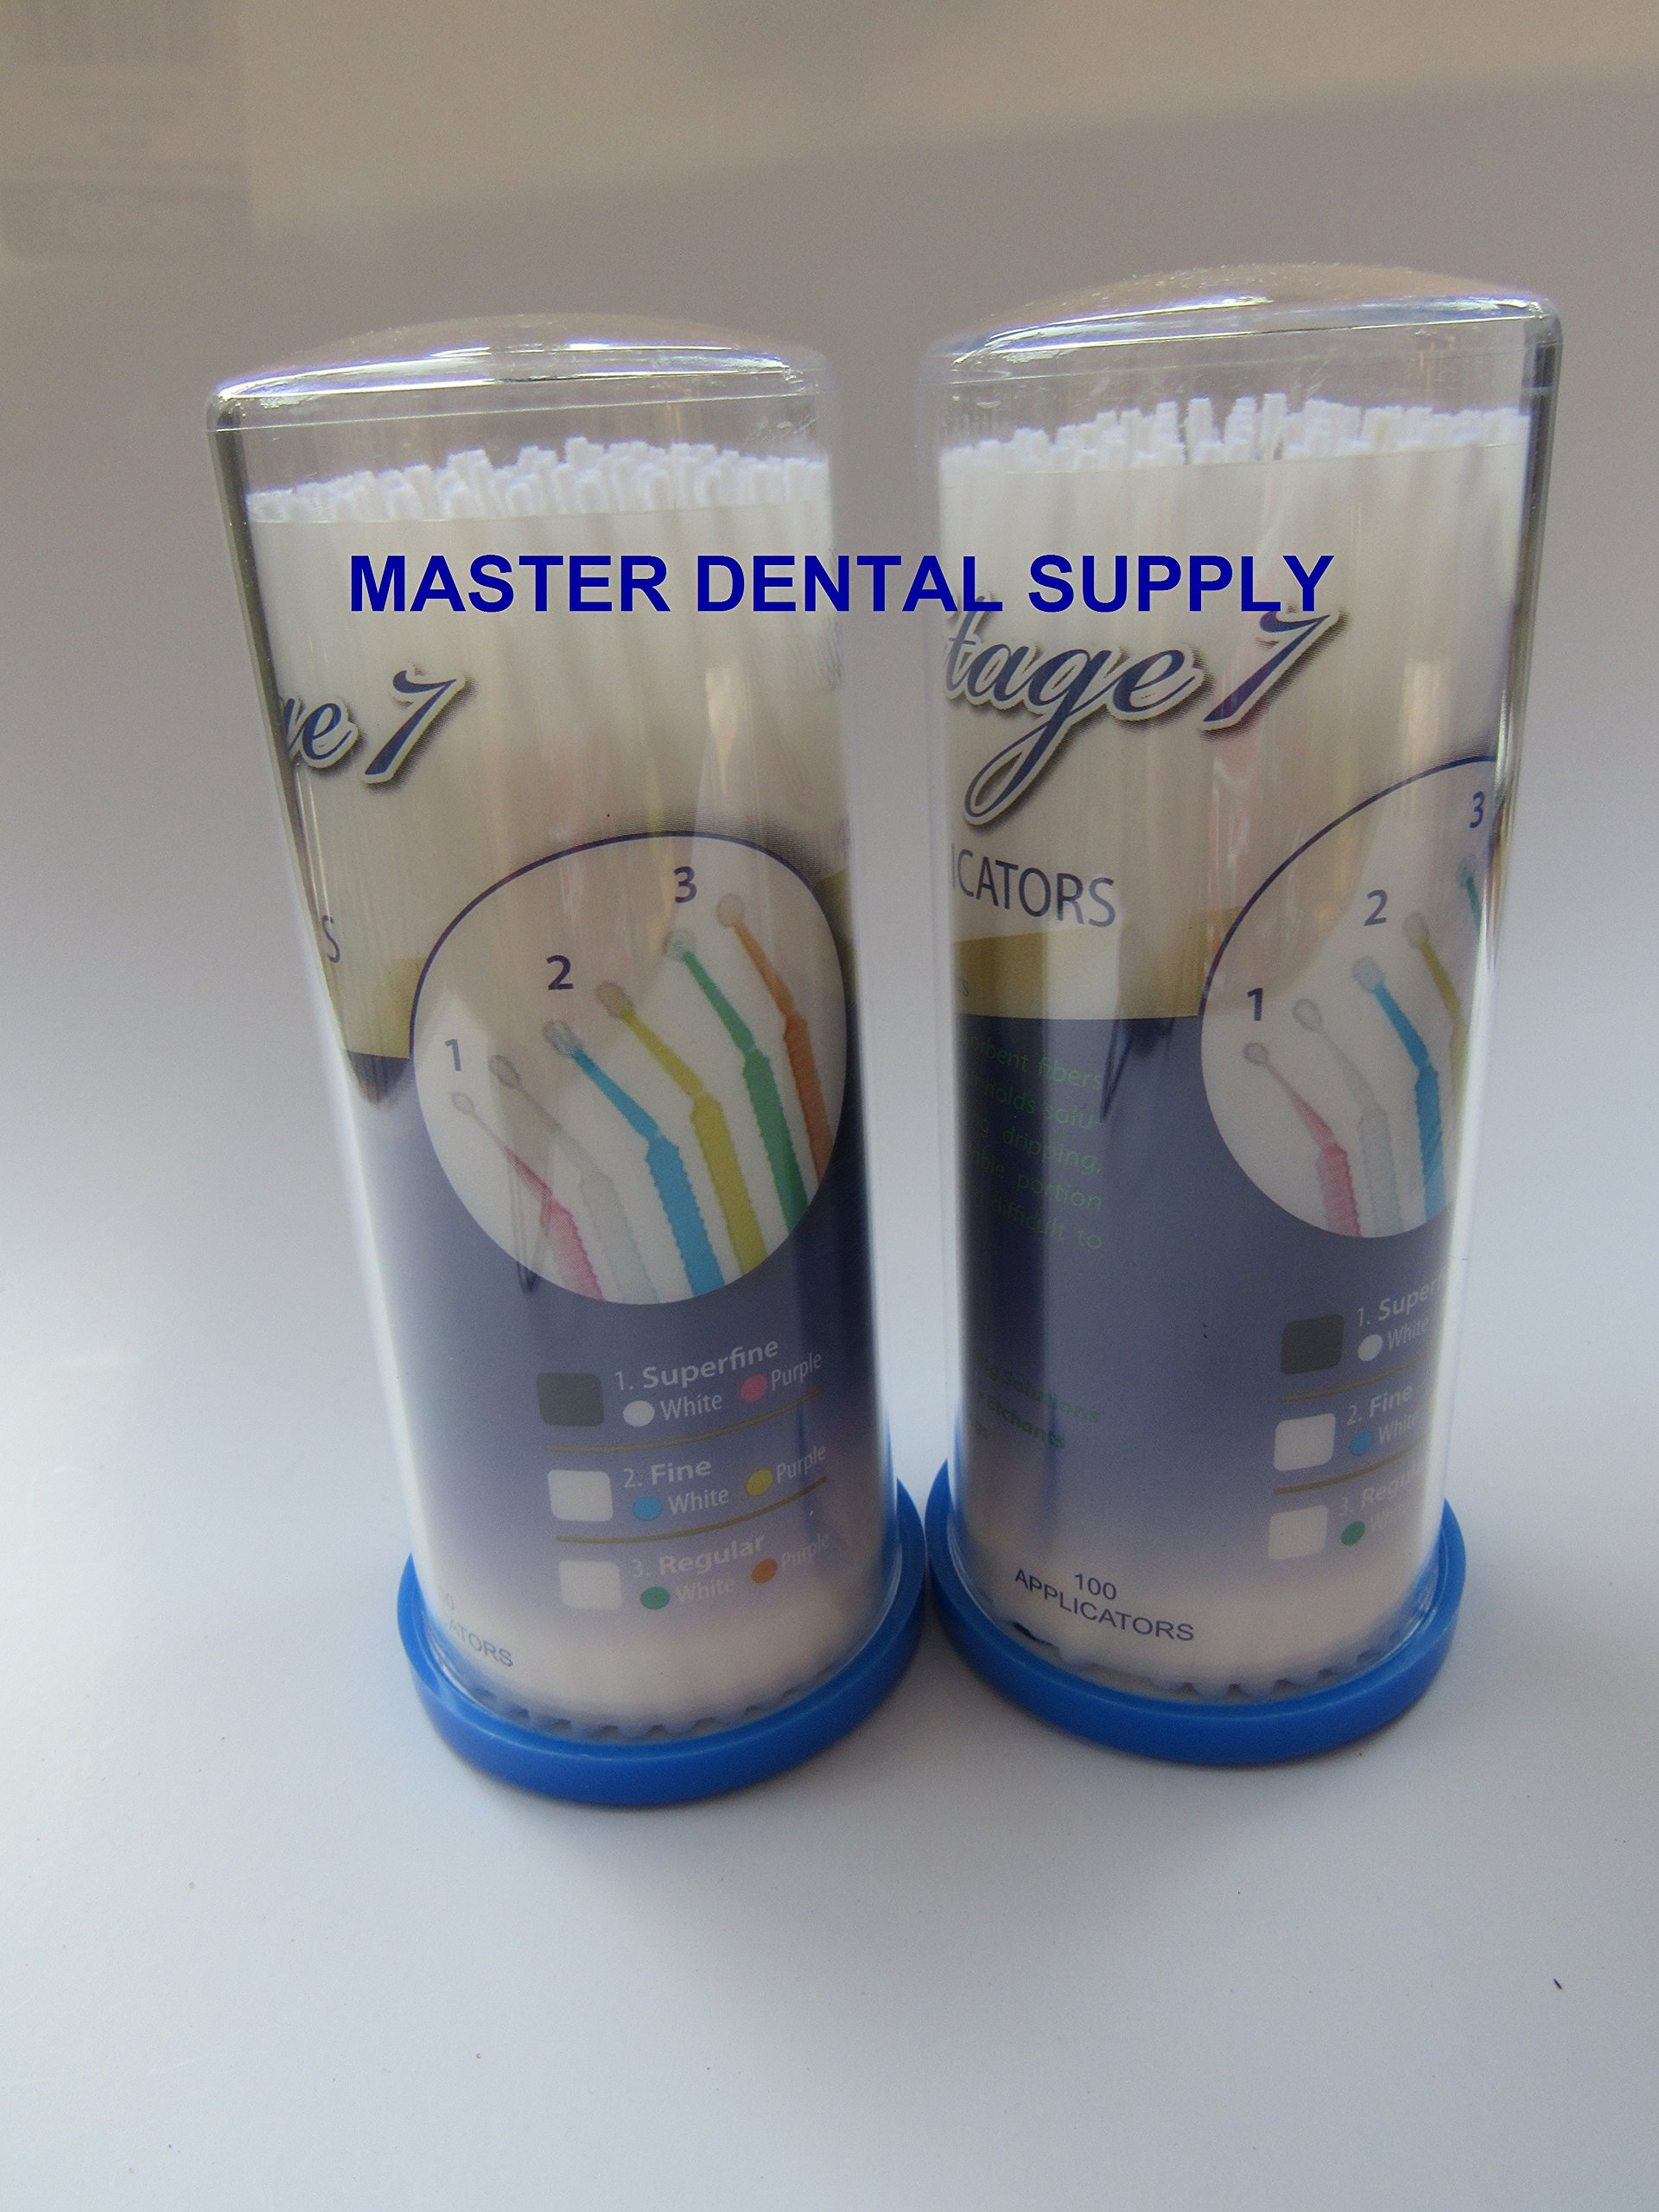 200 Dental Micro Applicator (2 x 100 Pcs/Tube) EXTRA FINE Small (0.1 mm) WHITE Disposable